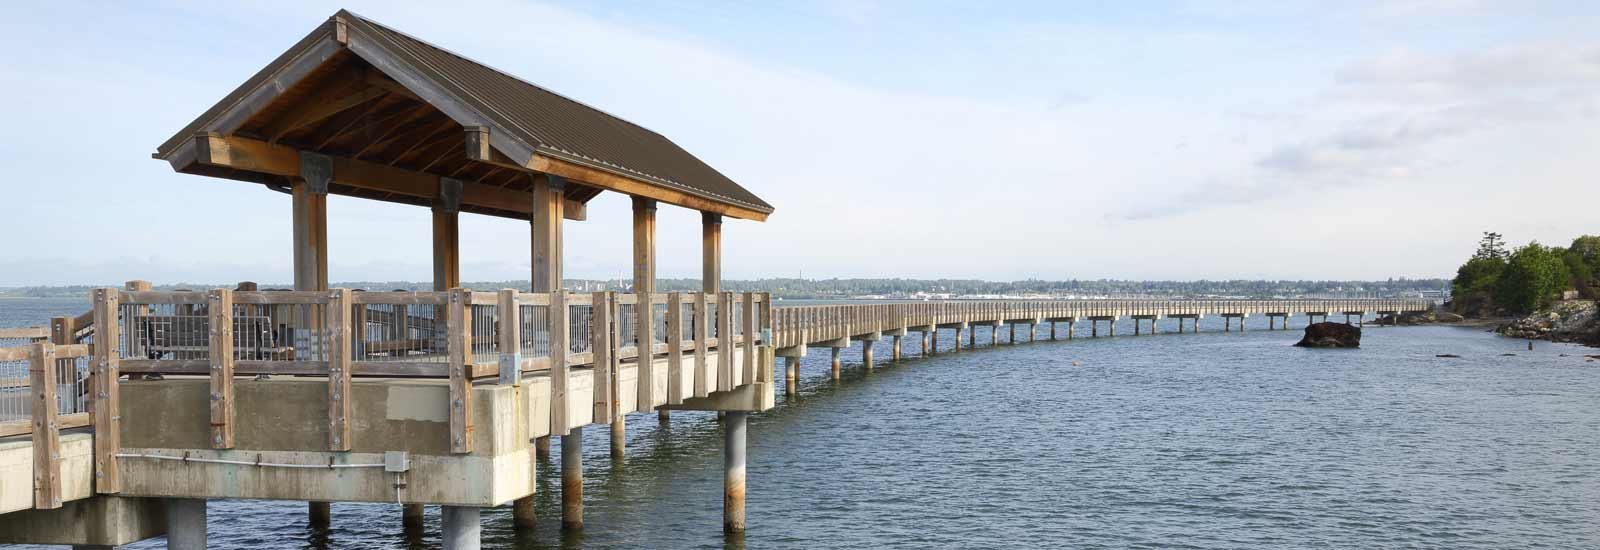 Bellingham waterfront